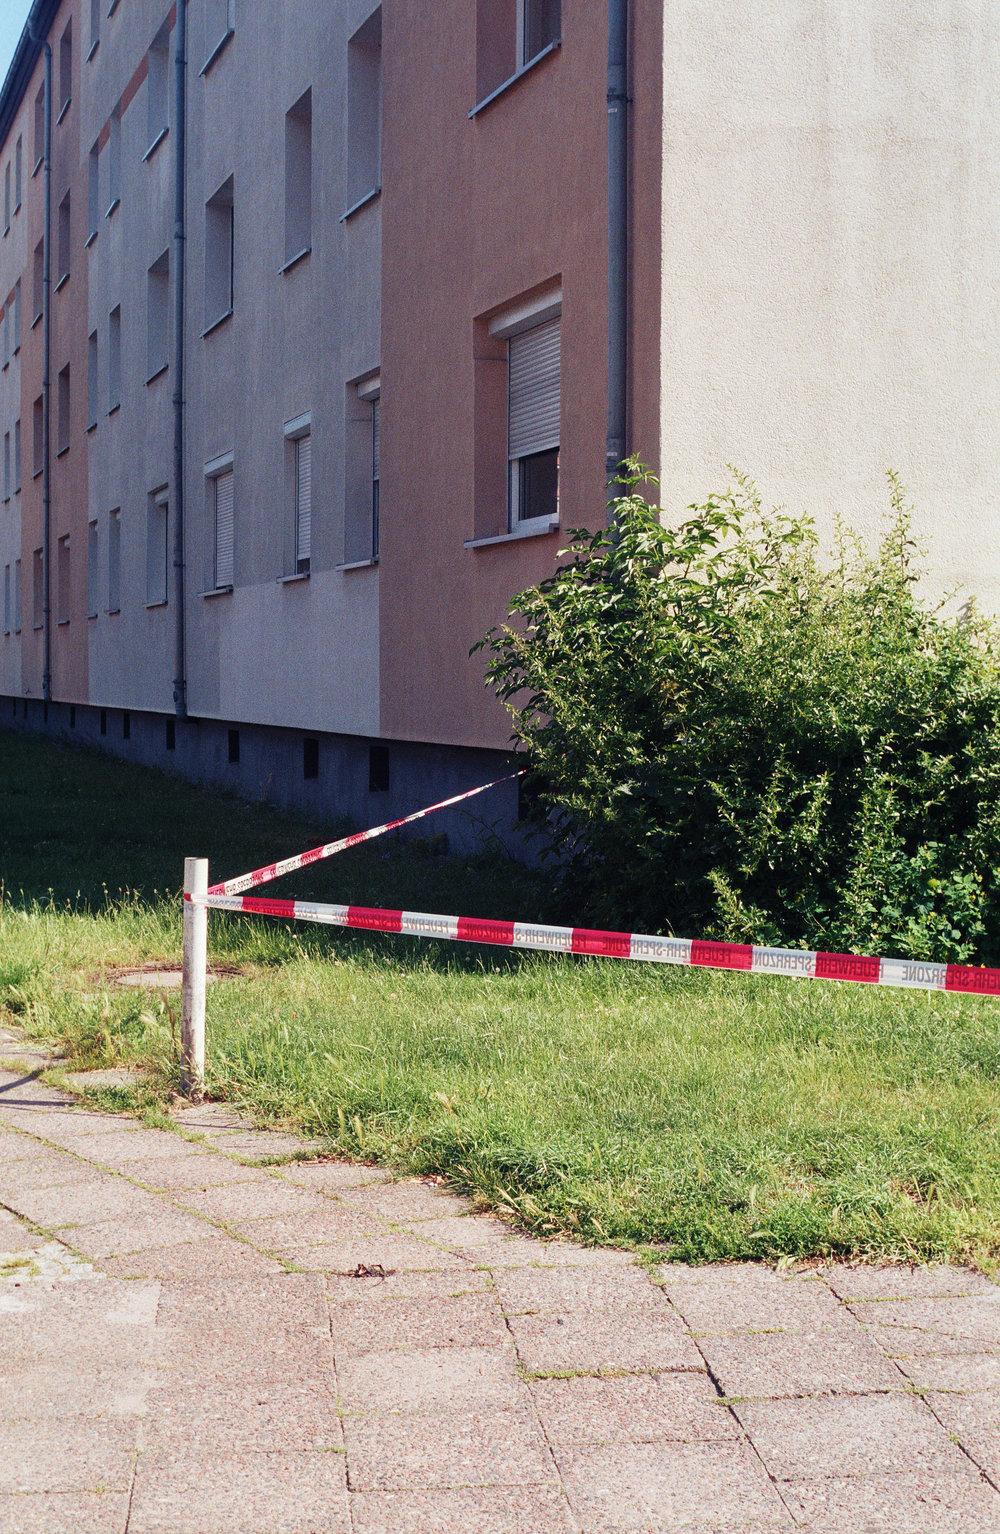 Berlin_72dpi-21.jpg